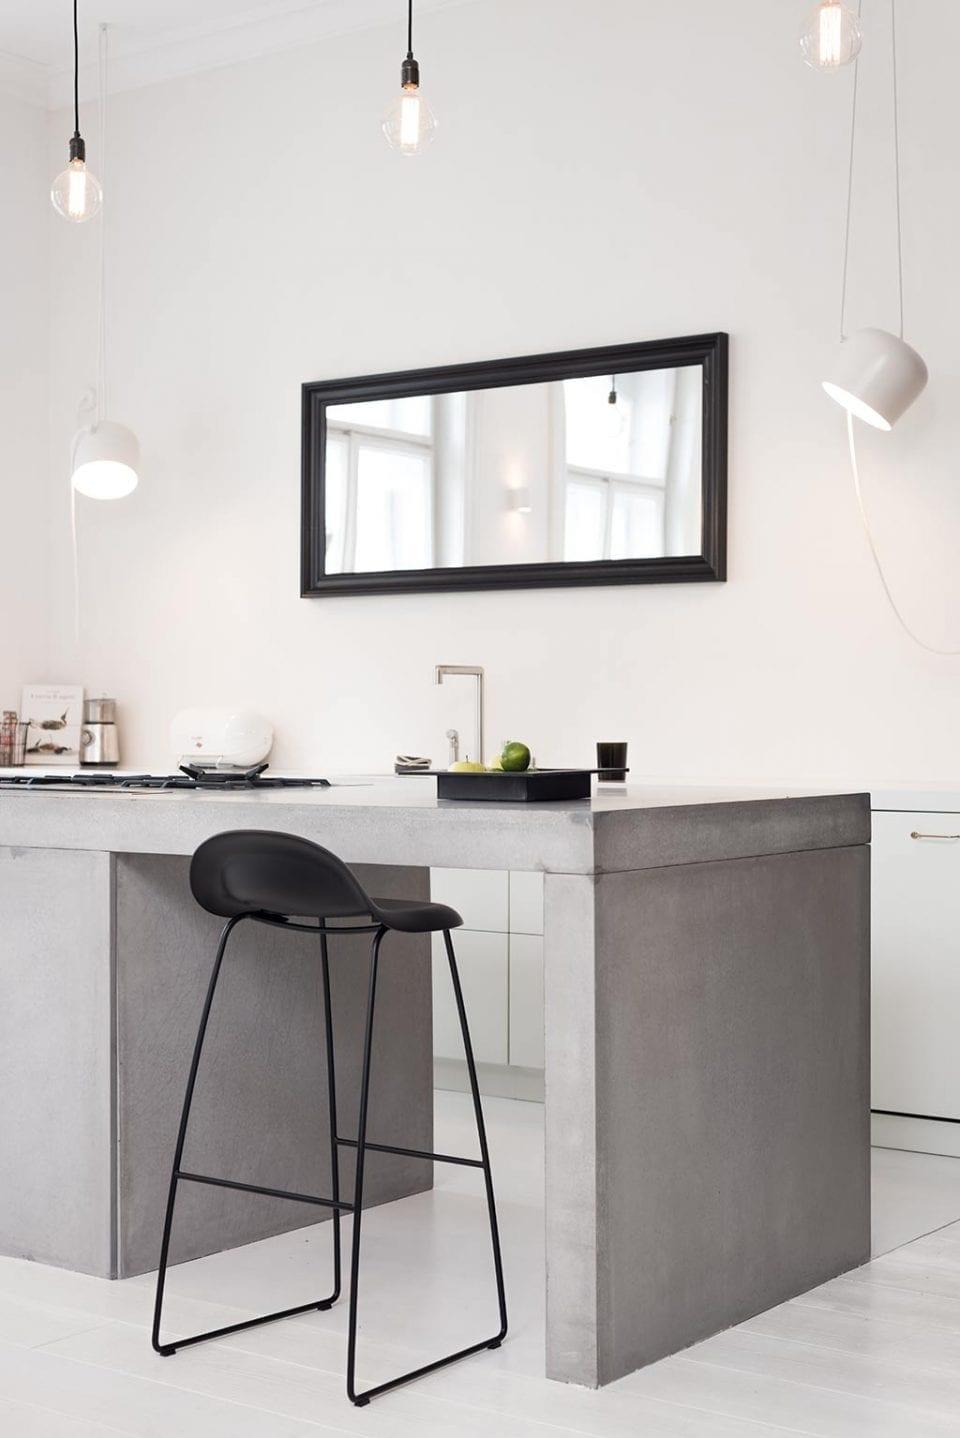 PN010 960x1438 - Look Inside: 1930s Czech Republic Apartment Re-invisioned